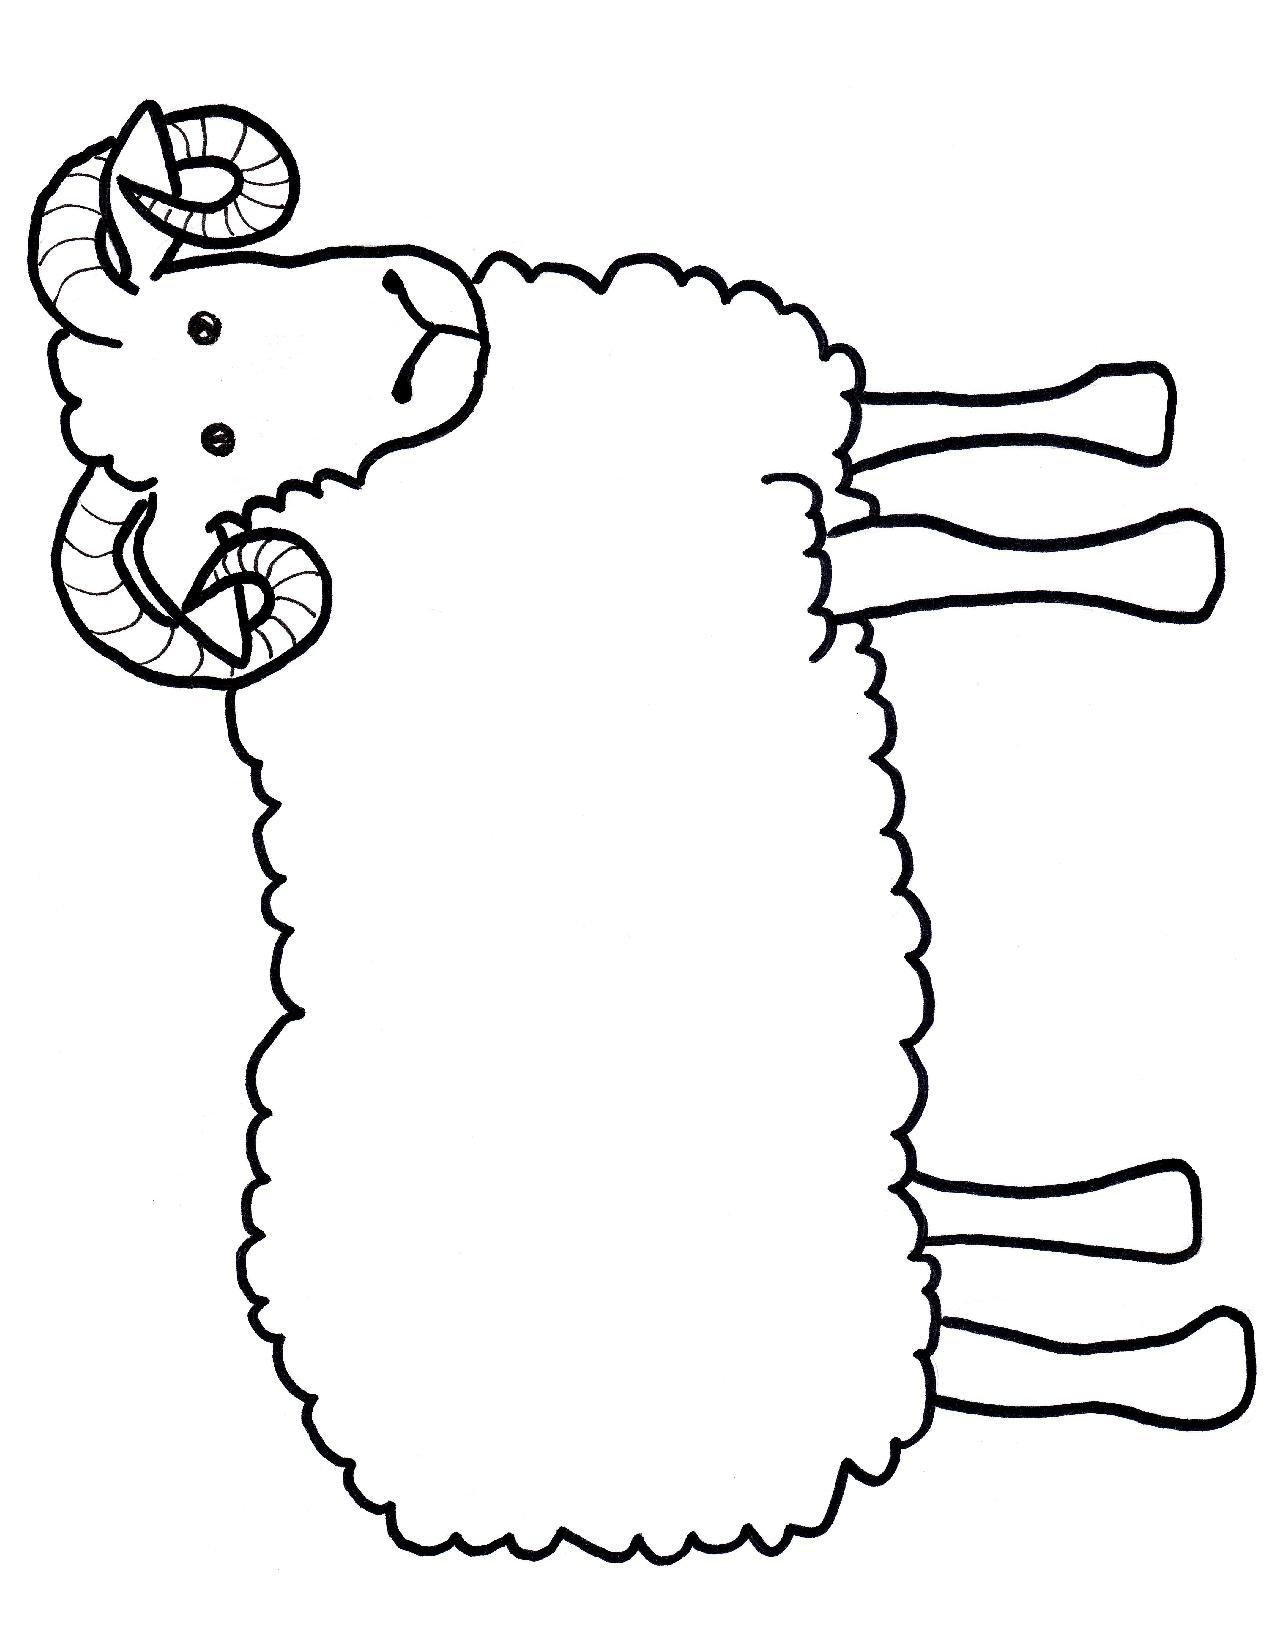 Black Sheep Outline